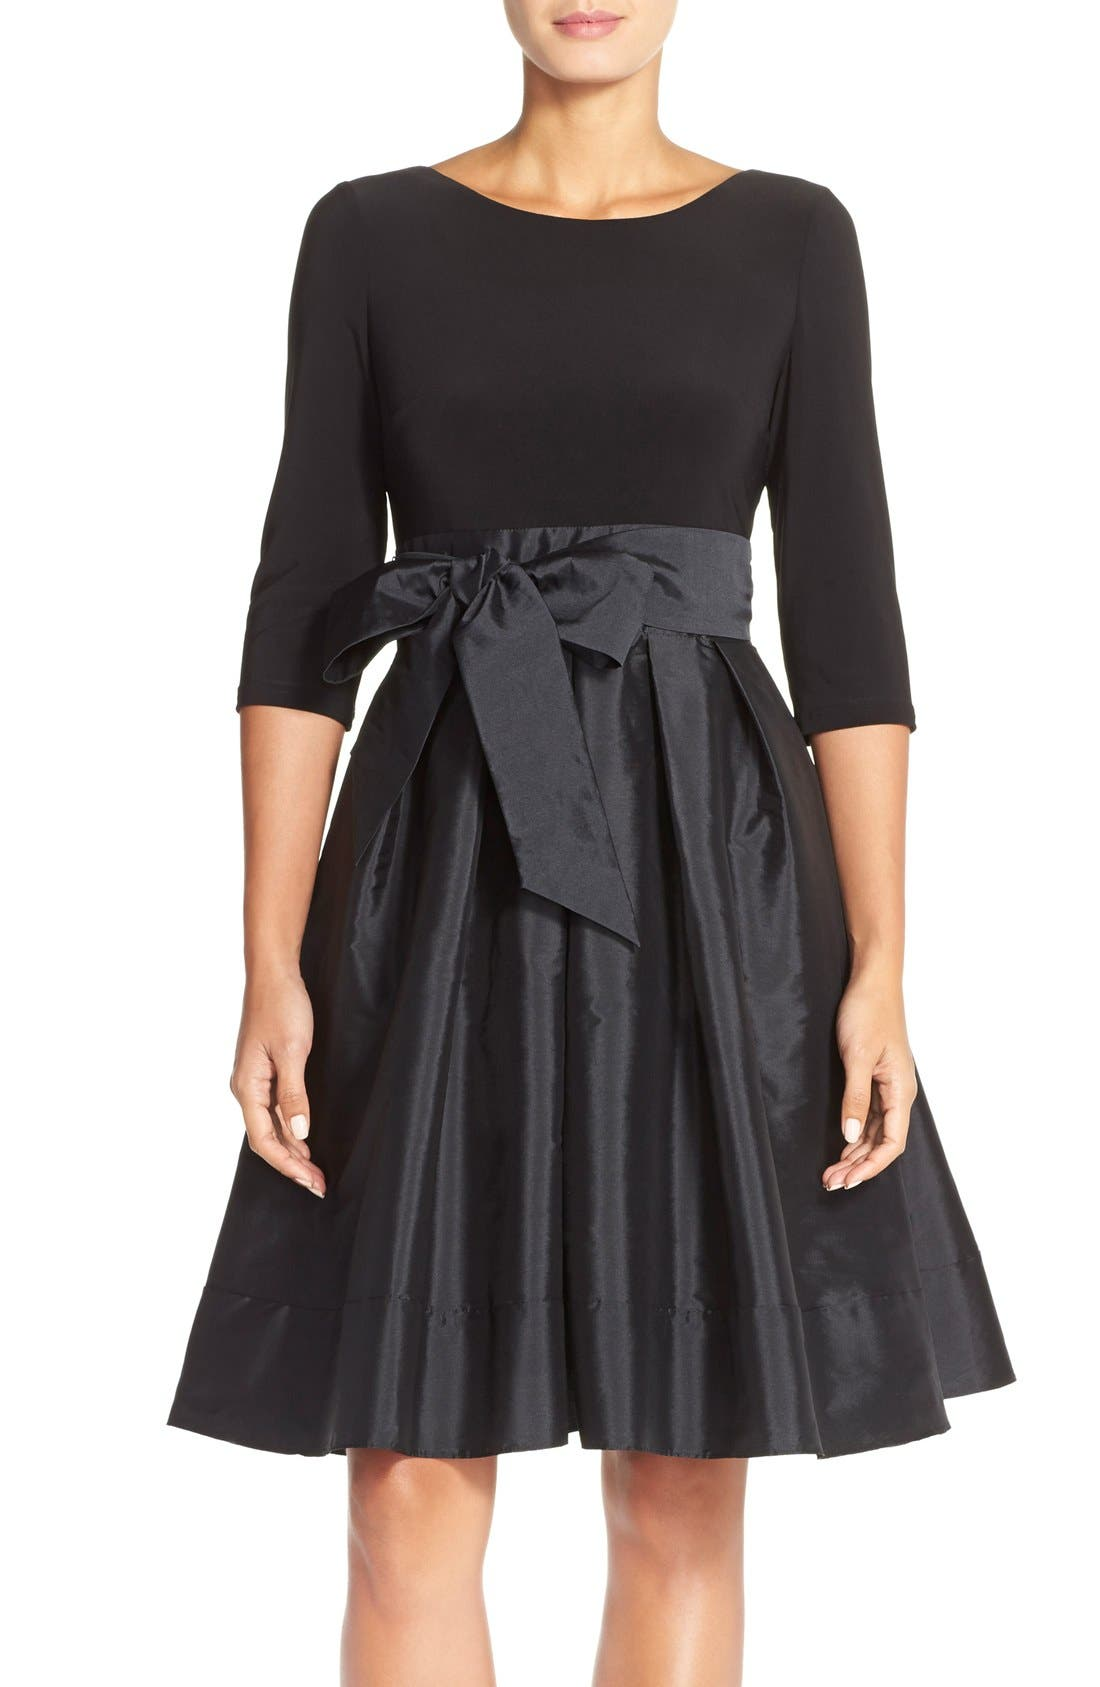 Main Image - Adrianna PapellBow Taffeta Fit & Flare Dress (Regular & Petite)